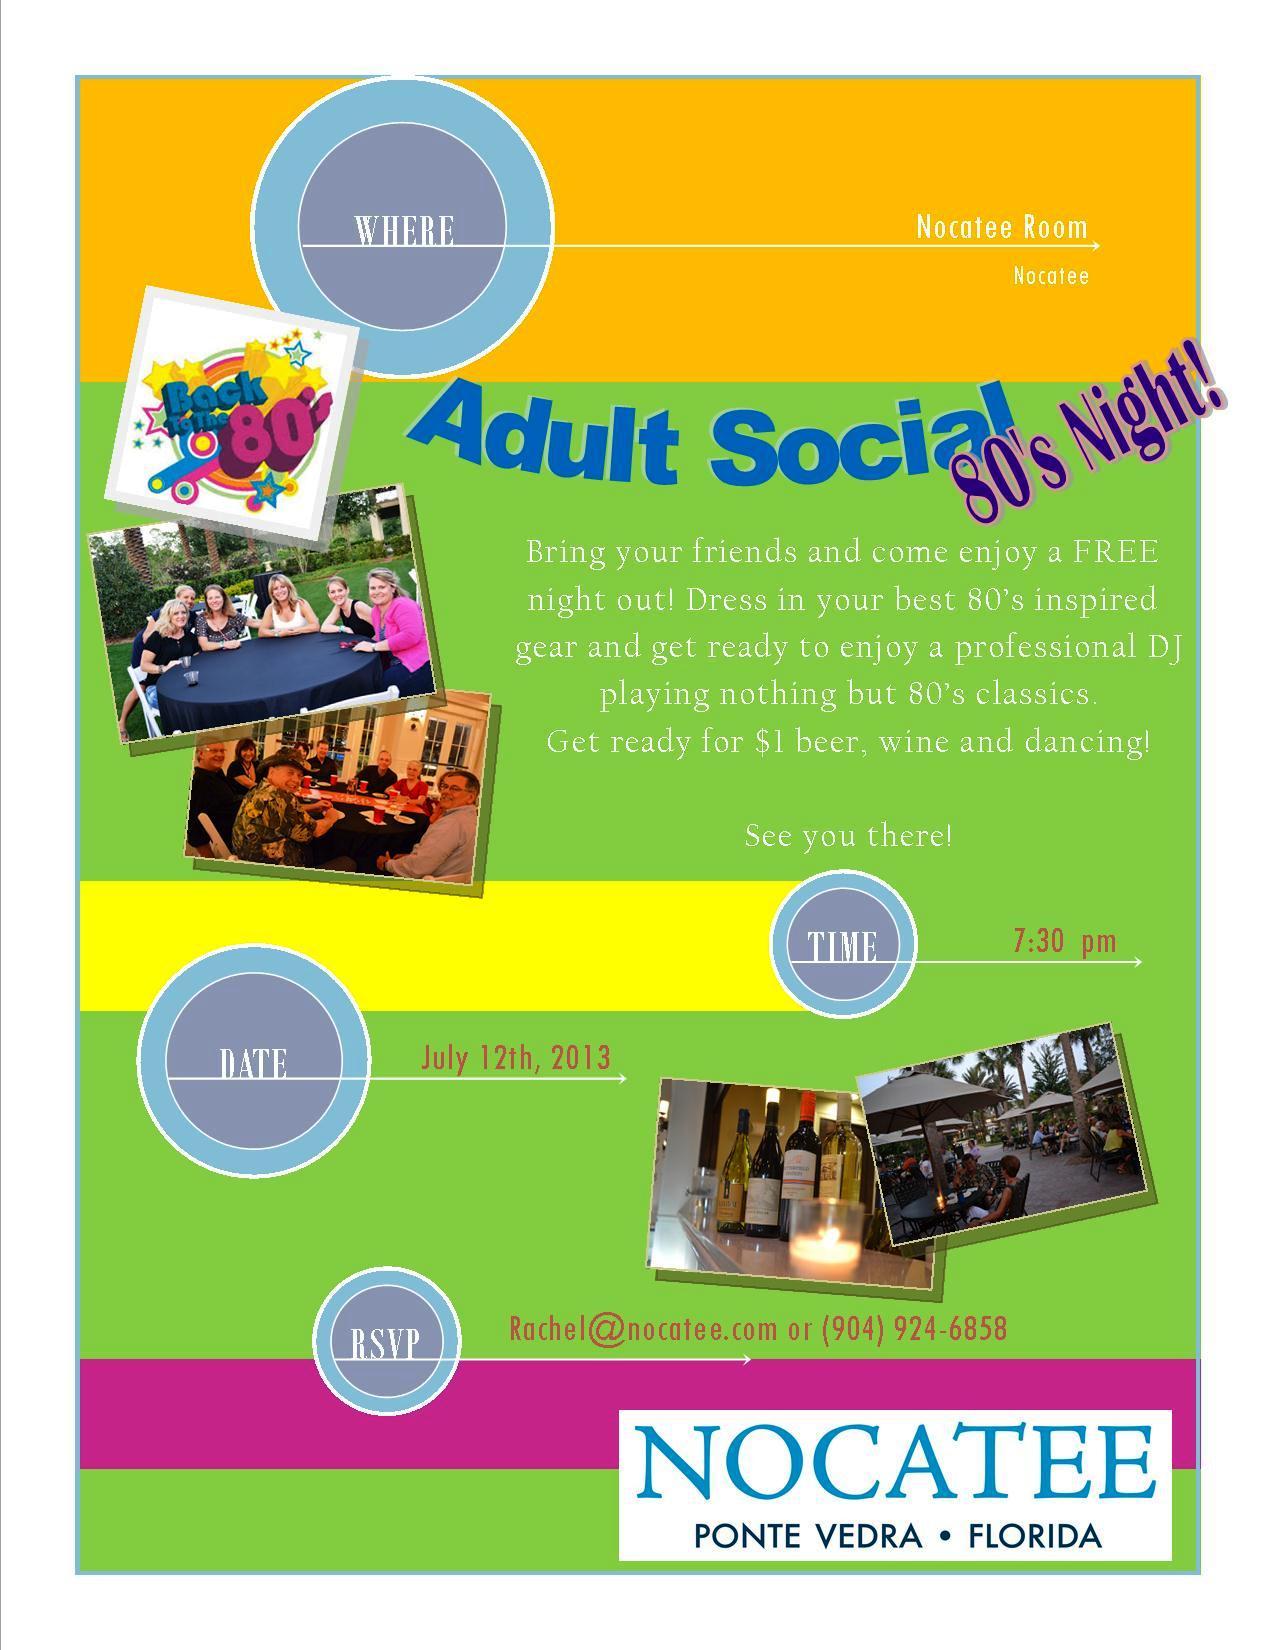 nocatee adult social